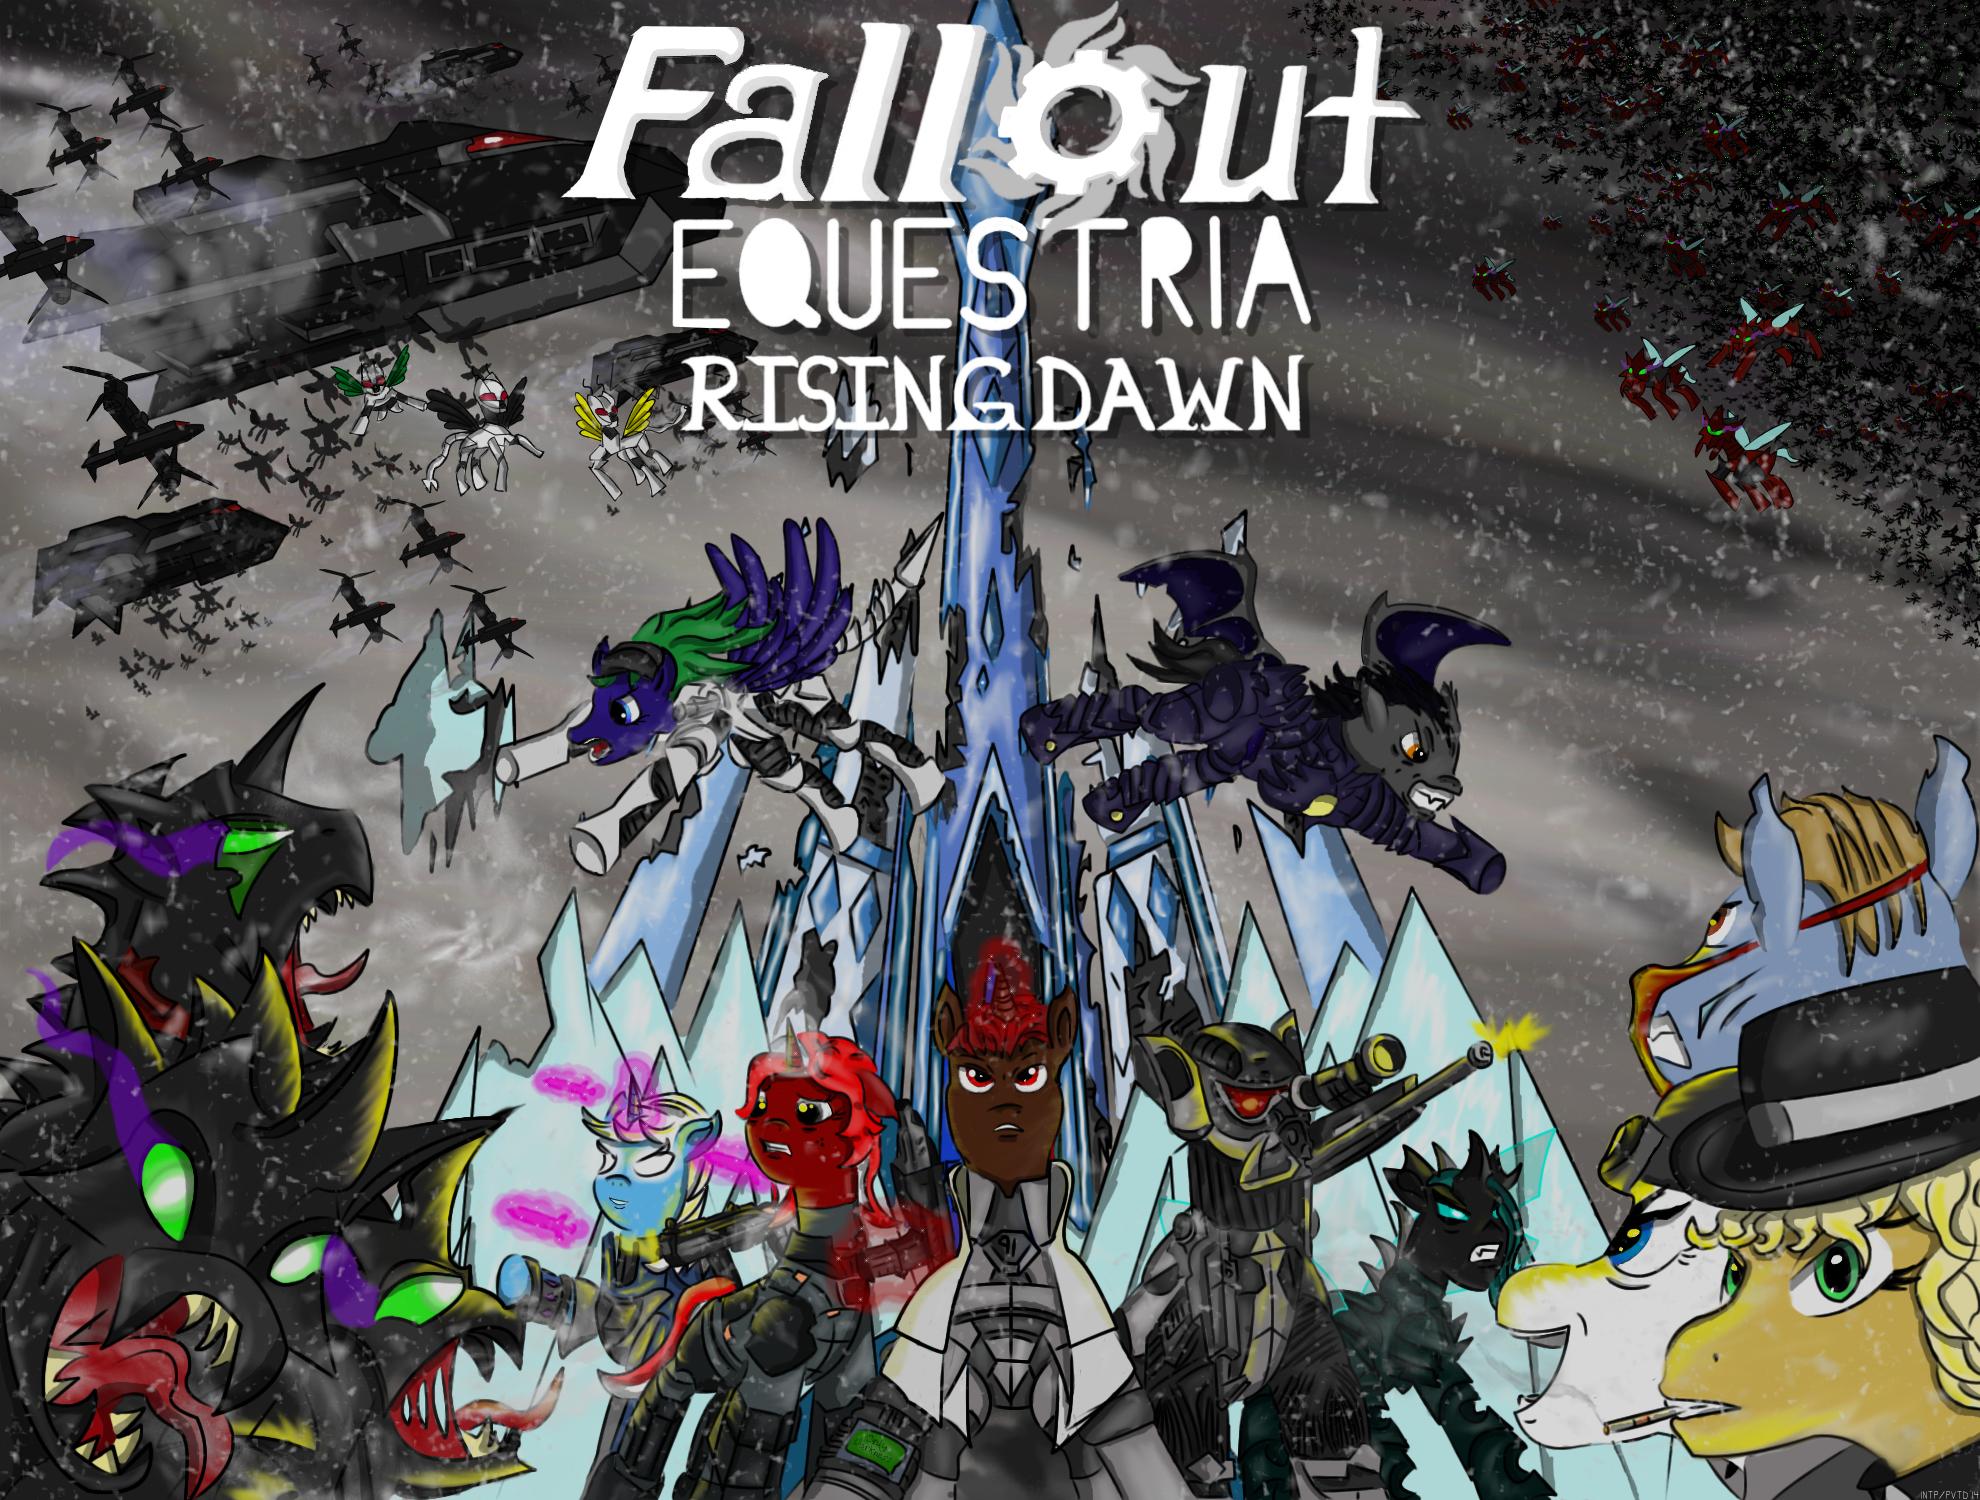 Art Fallout 2014  >> Image Fallout Equestria Rising Dawn Cover Art Jpg Fallout